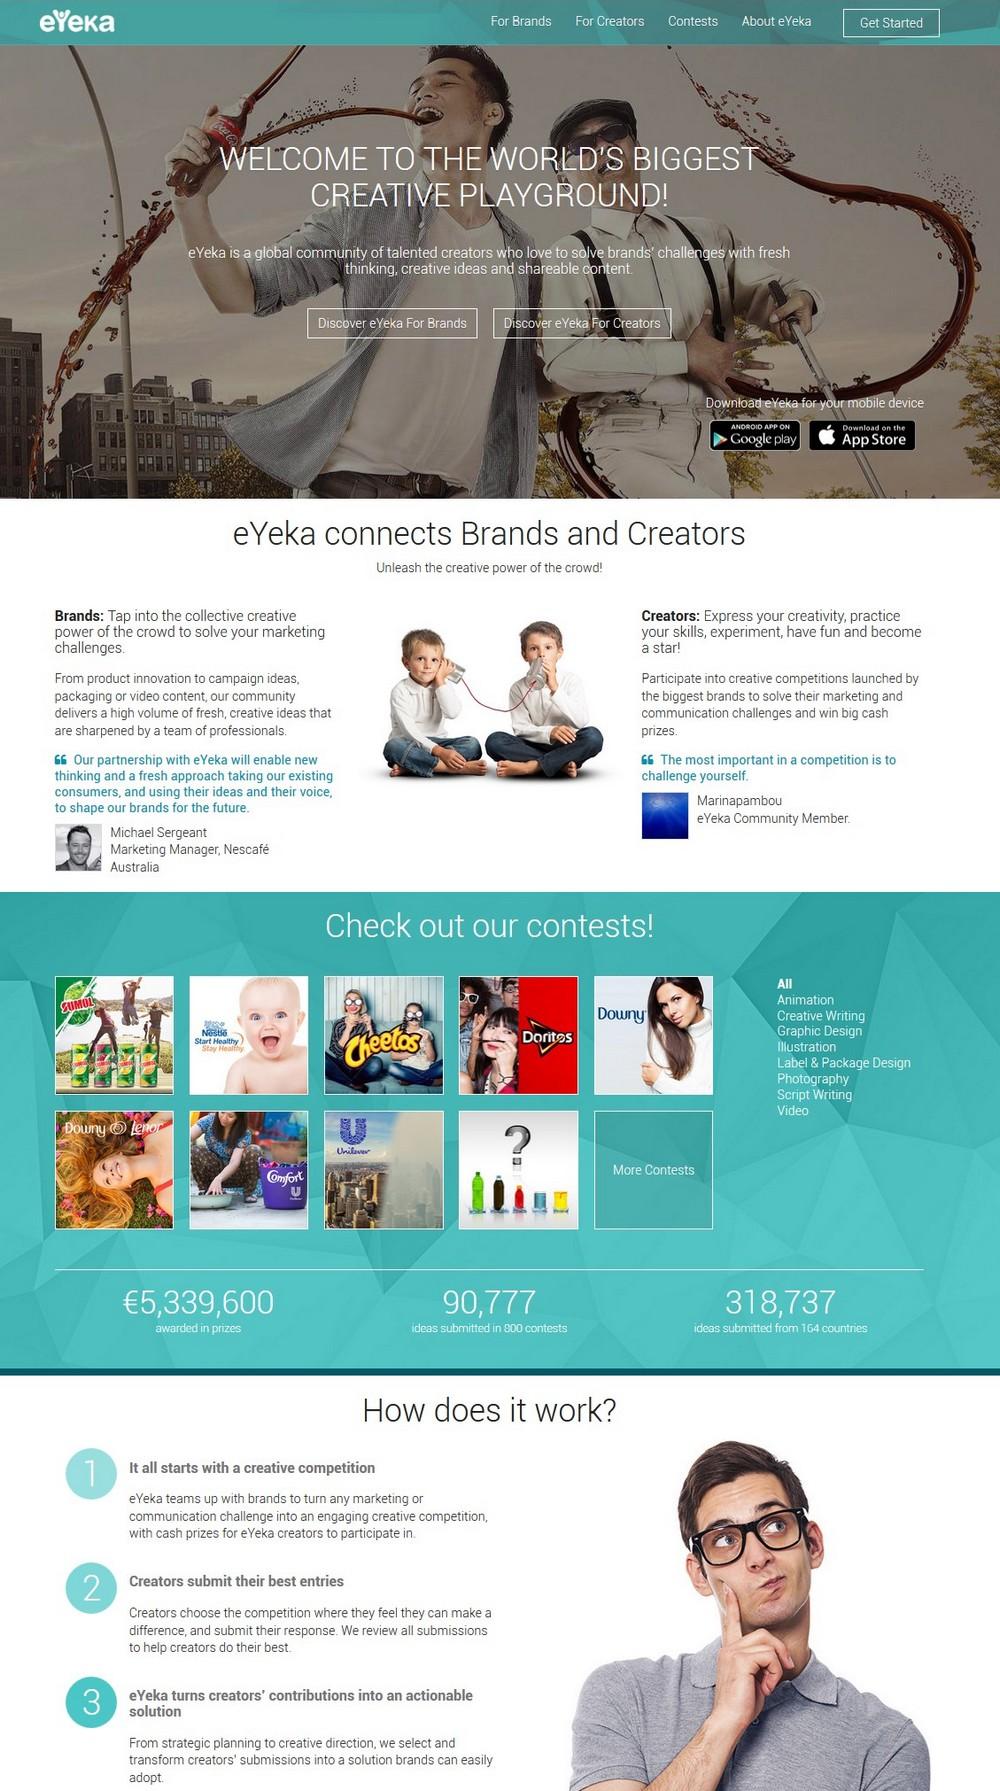 June 2015 - screenshot eyeka.pr.co press releases New eYeka Platform 2